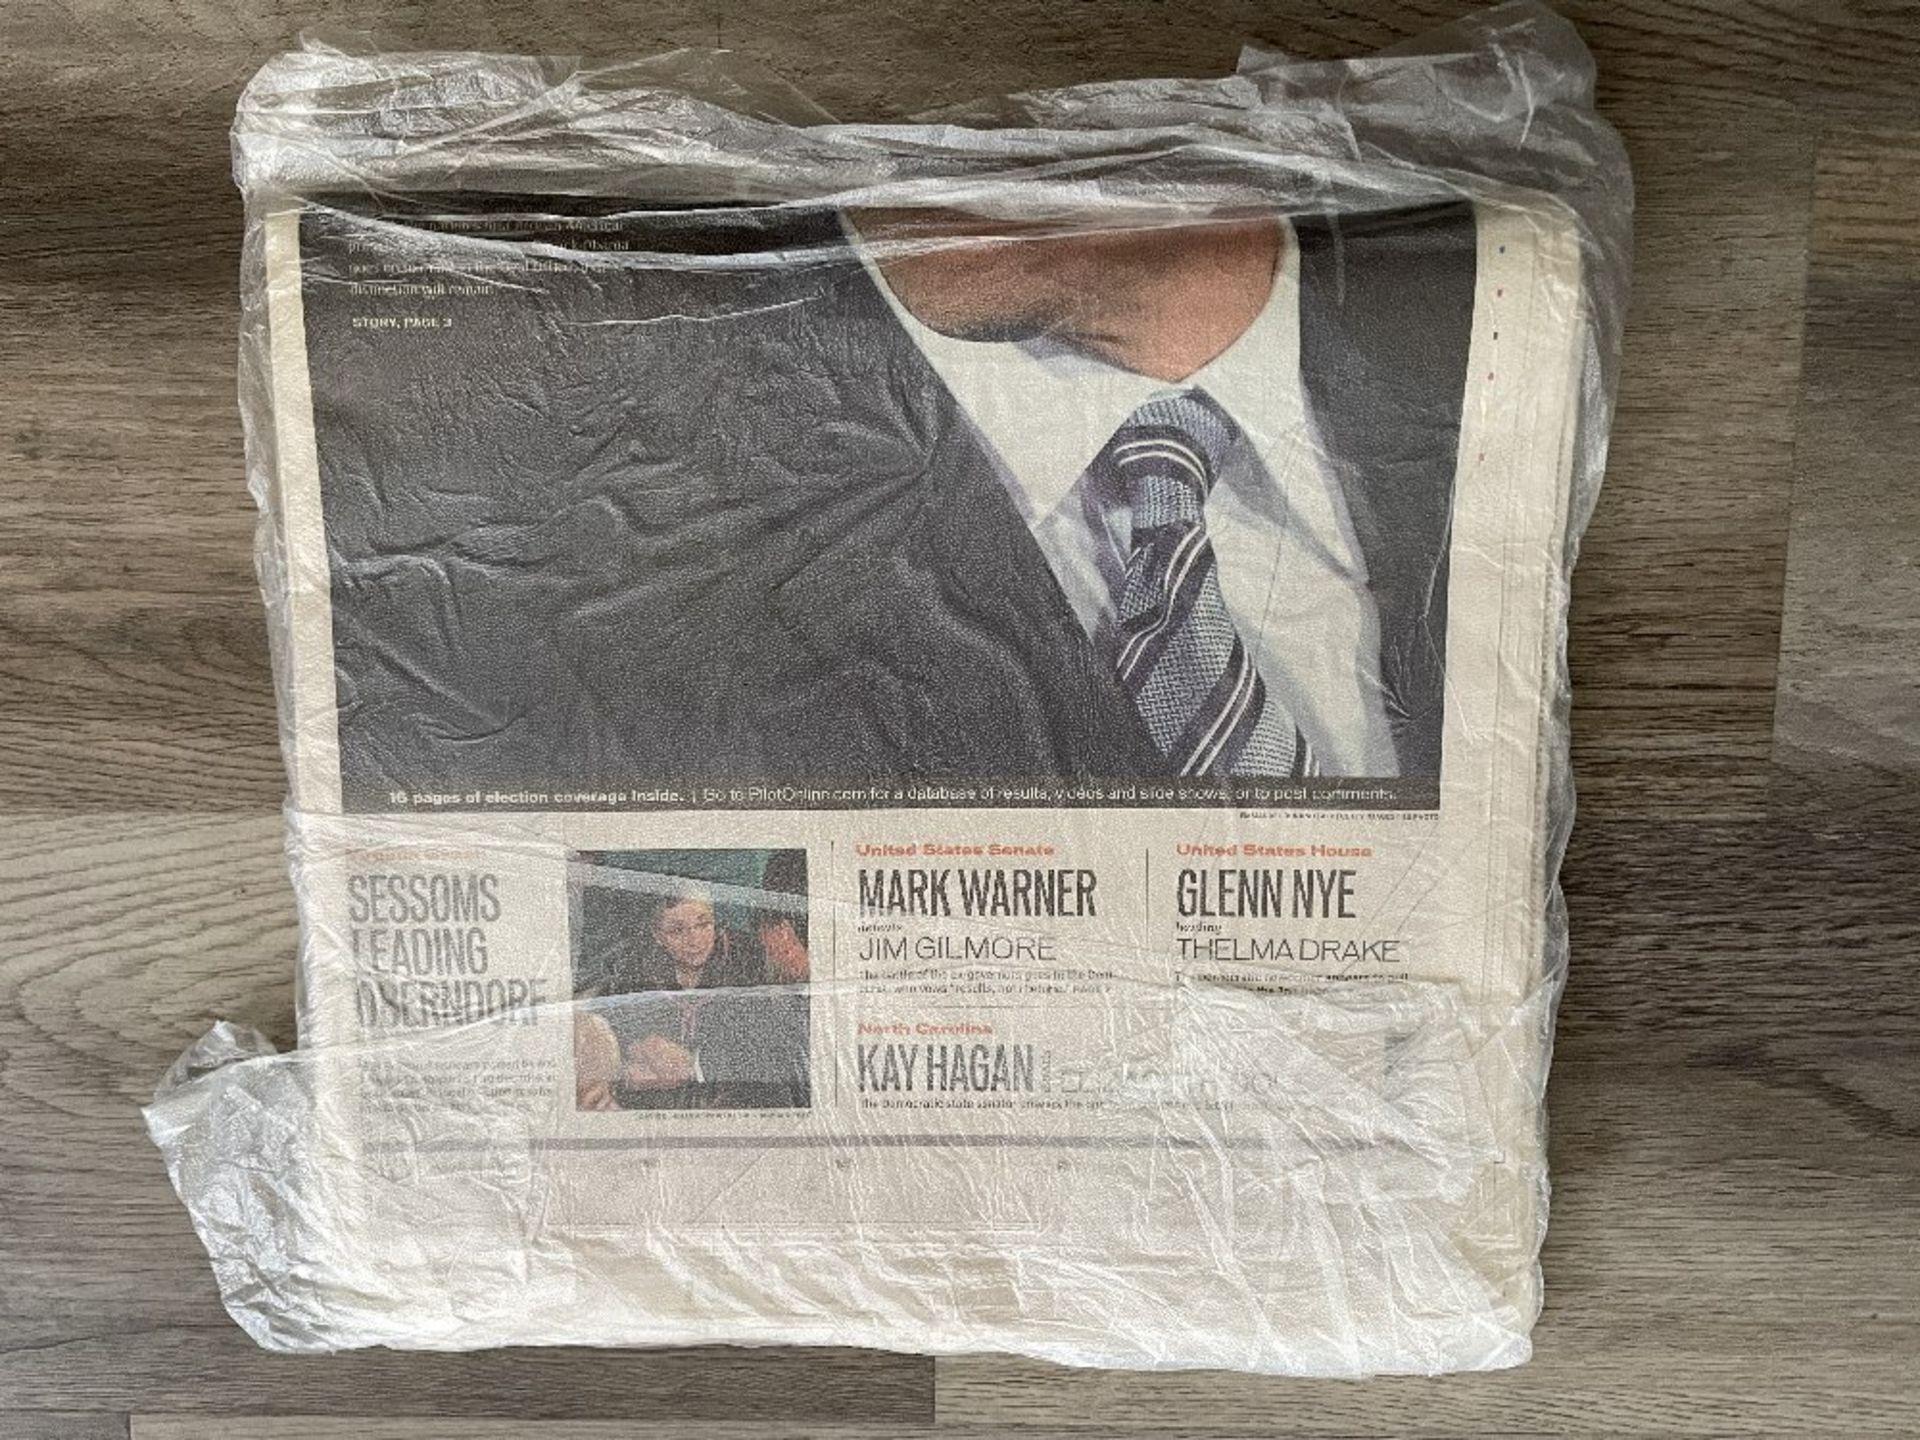 Barack Obama Newspaper from 2008 - Image 3 of 3